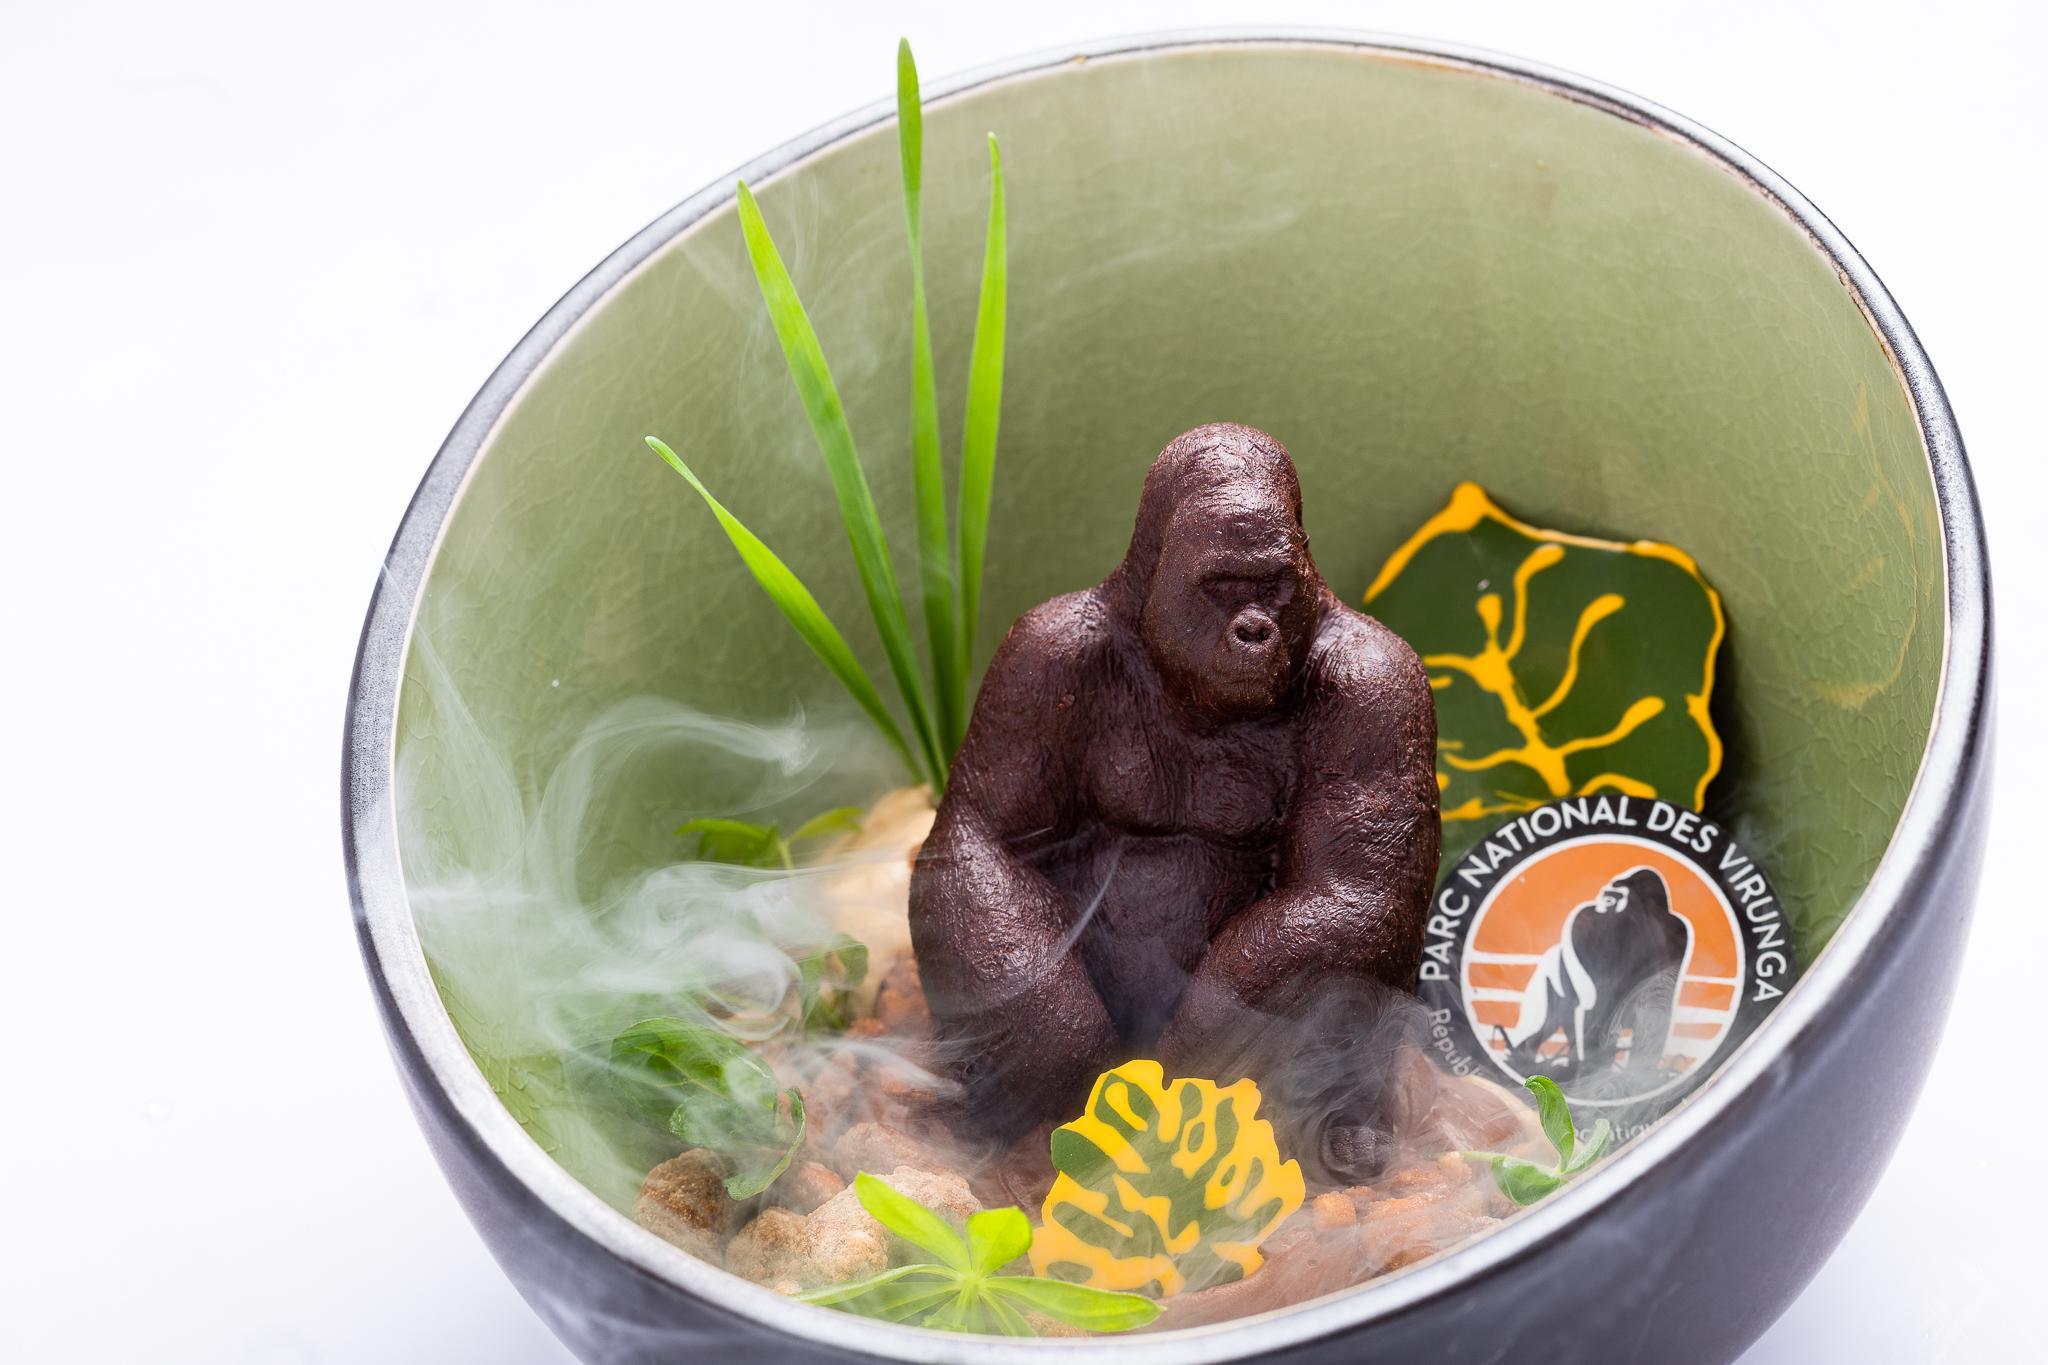 Gorillas in the mist: Virunga chocolate, hazelnut, apple, sorrel - THE CHOCOLATE LINE